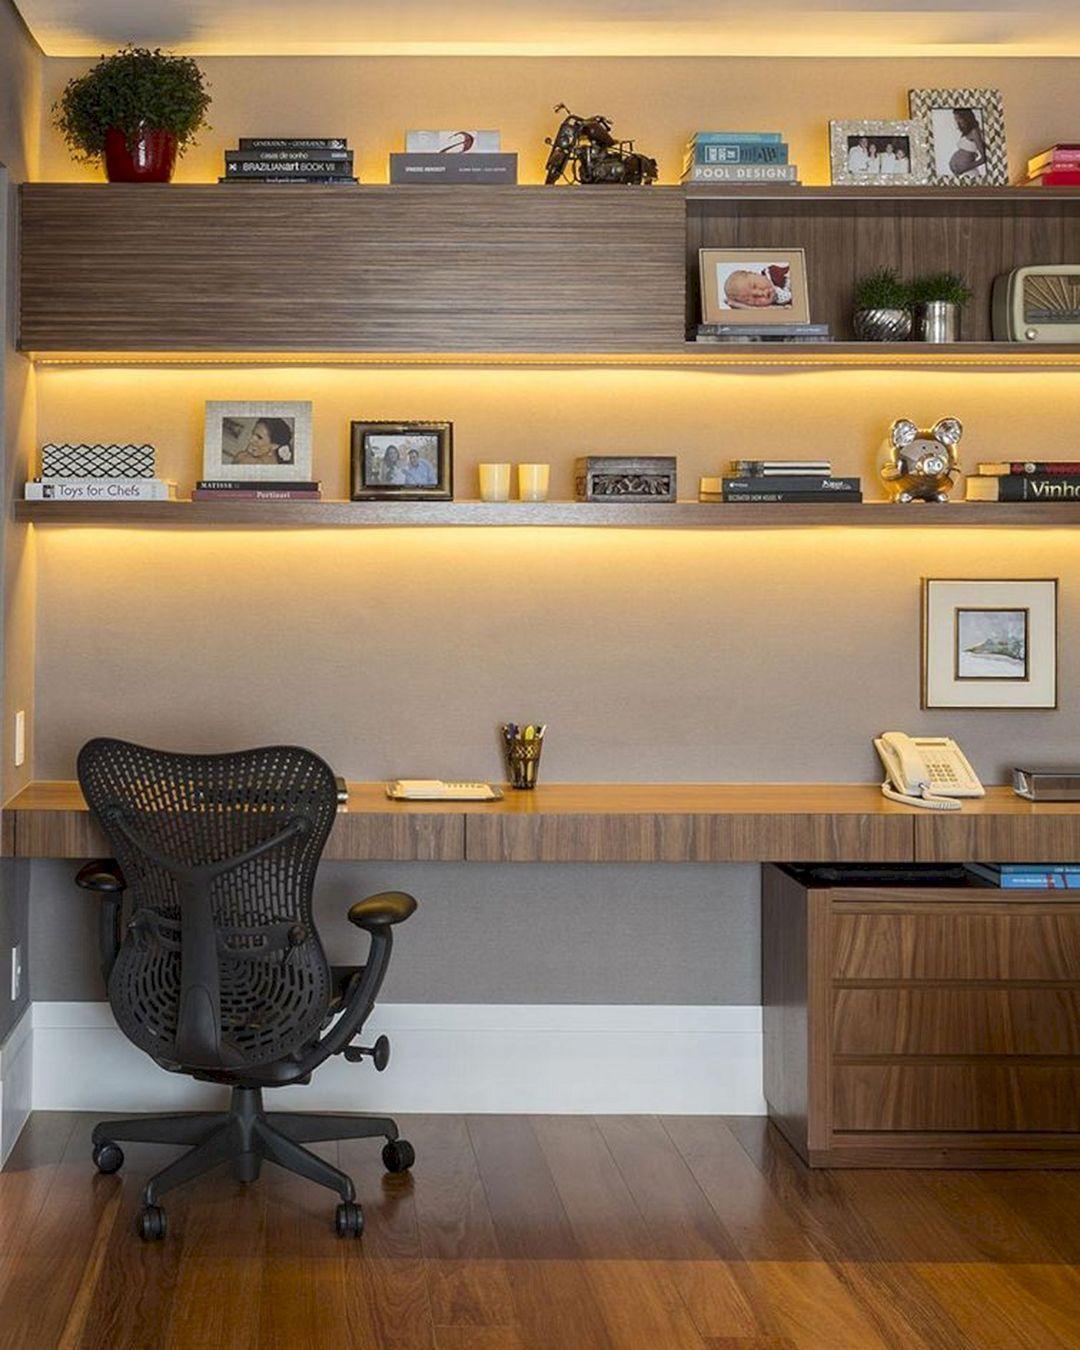 Interior Designmodern Home Office: Study Room Interior Design Ideas 1 (Study Room Interior